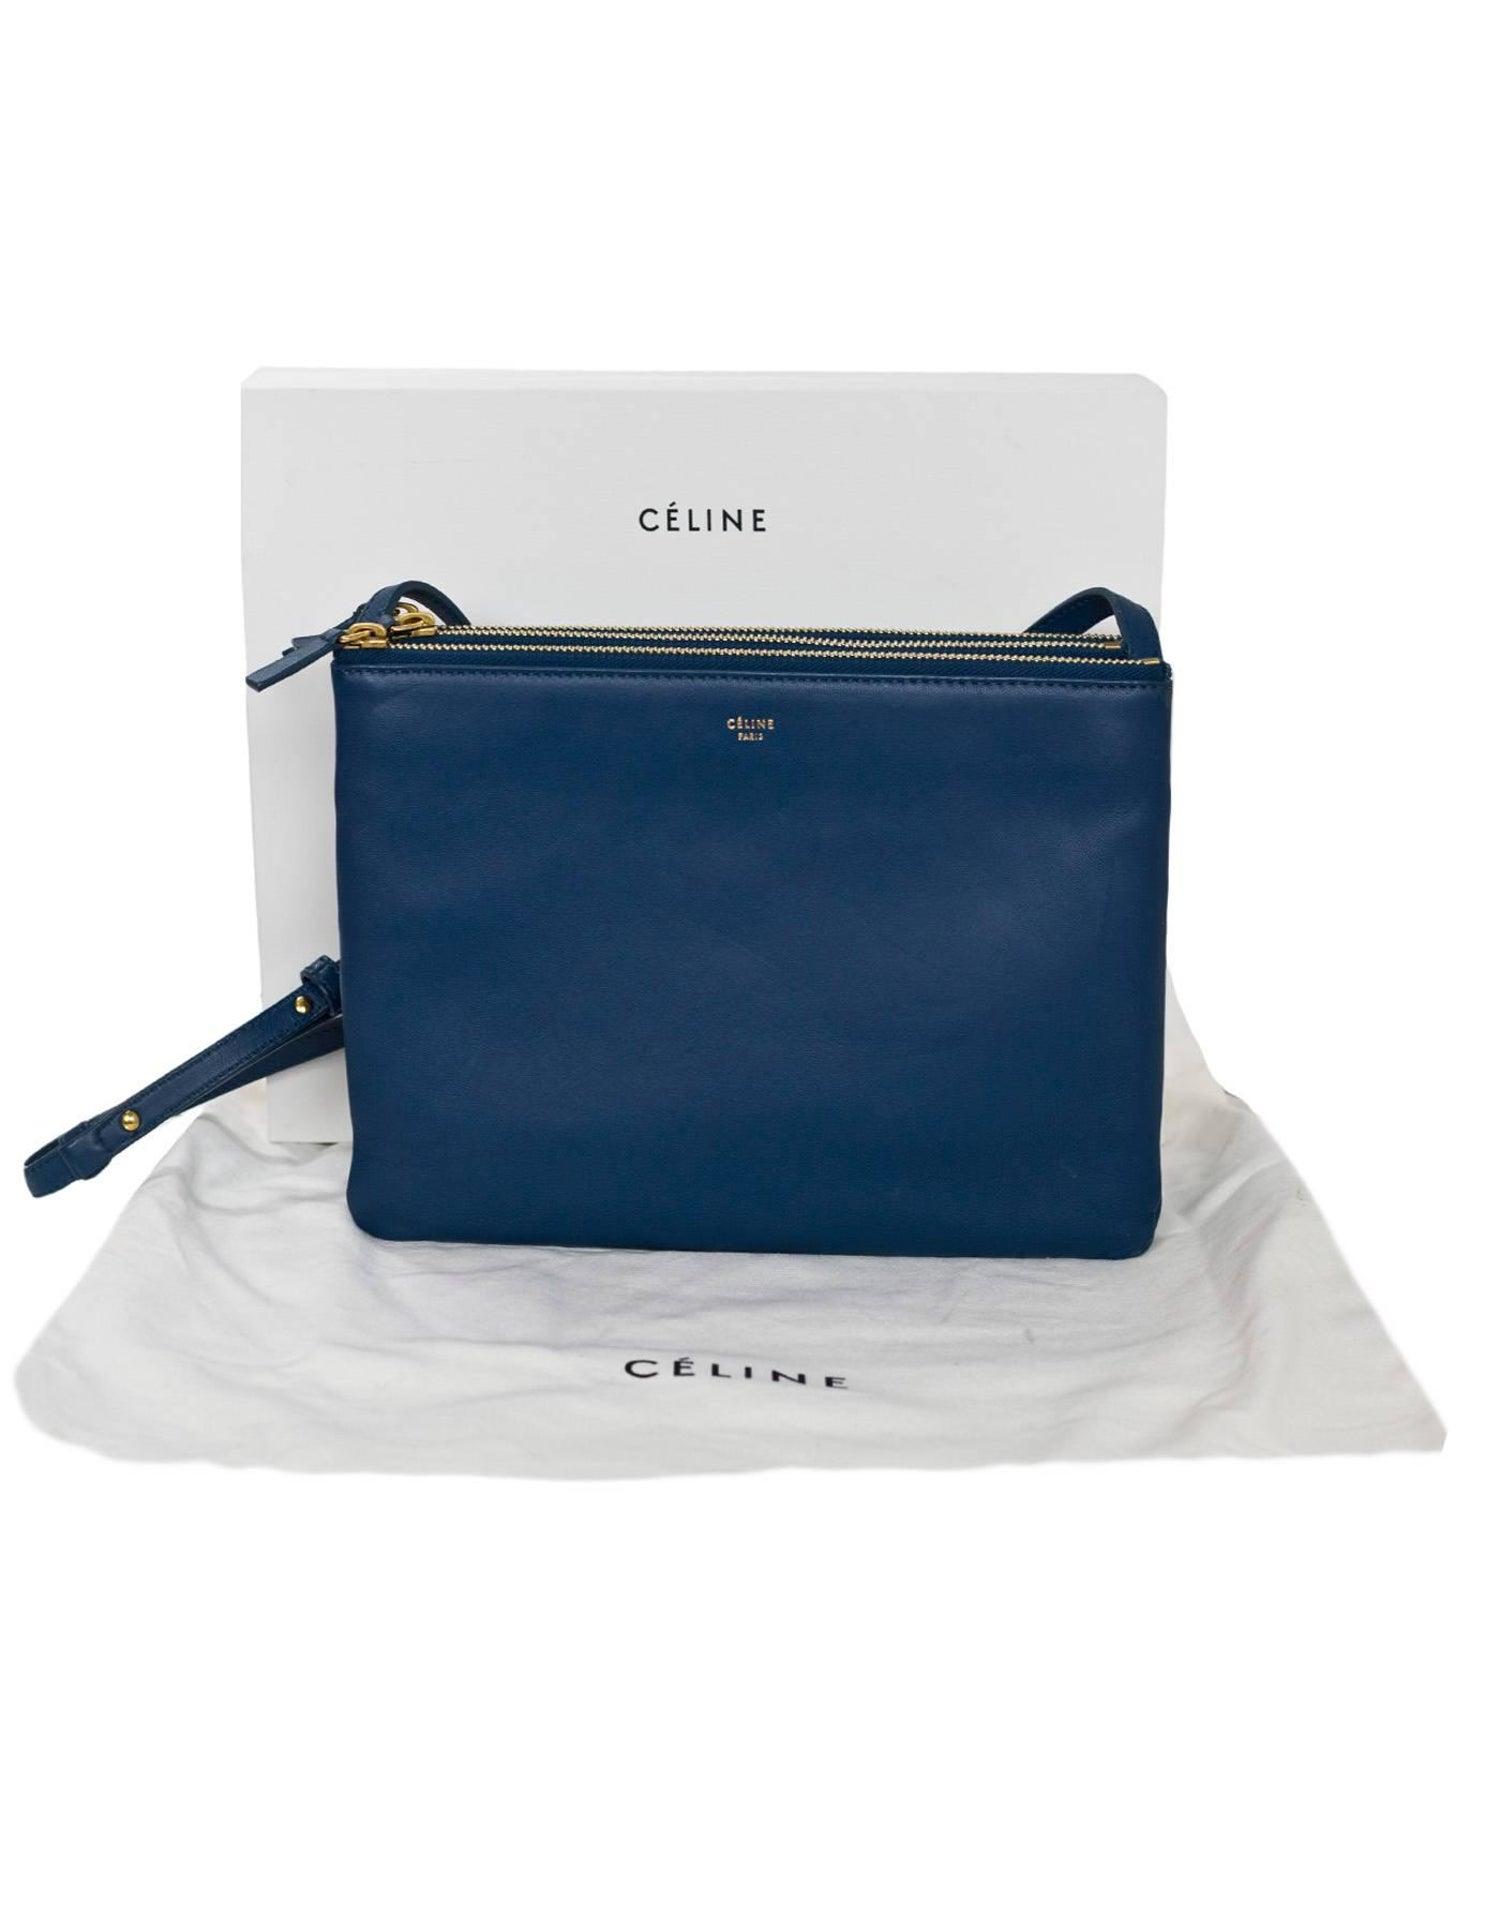 Celine Blue Lambskin Leather Large Trio Crossbody Clutch Bag For Sale at  1stdibs 05436101c3f2c